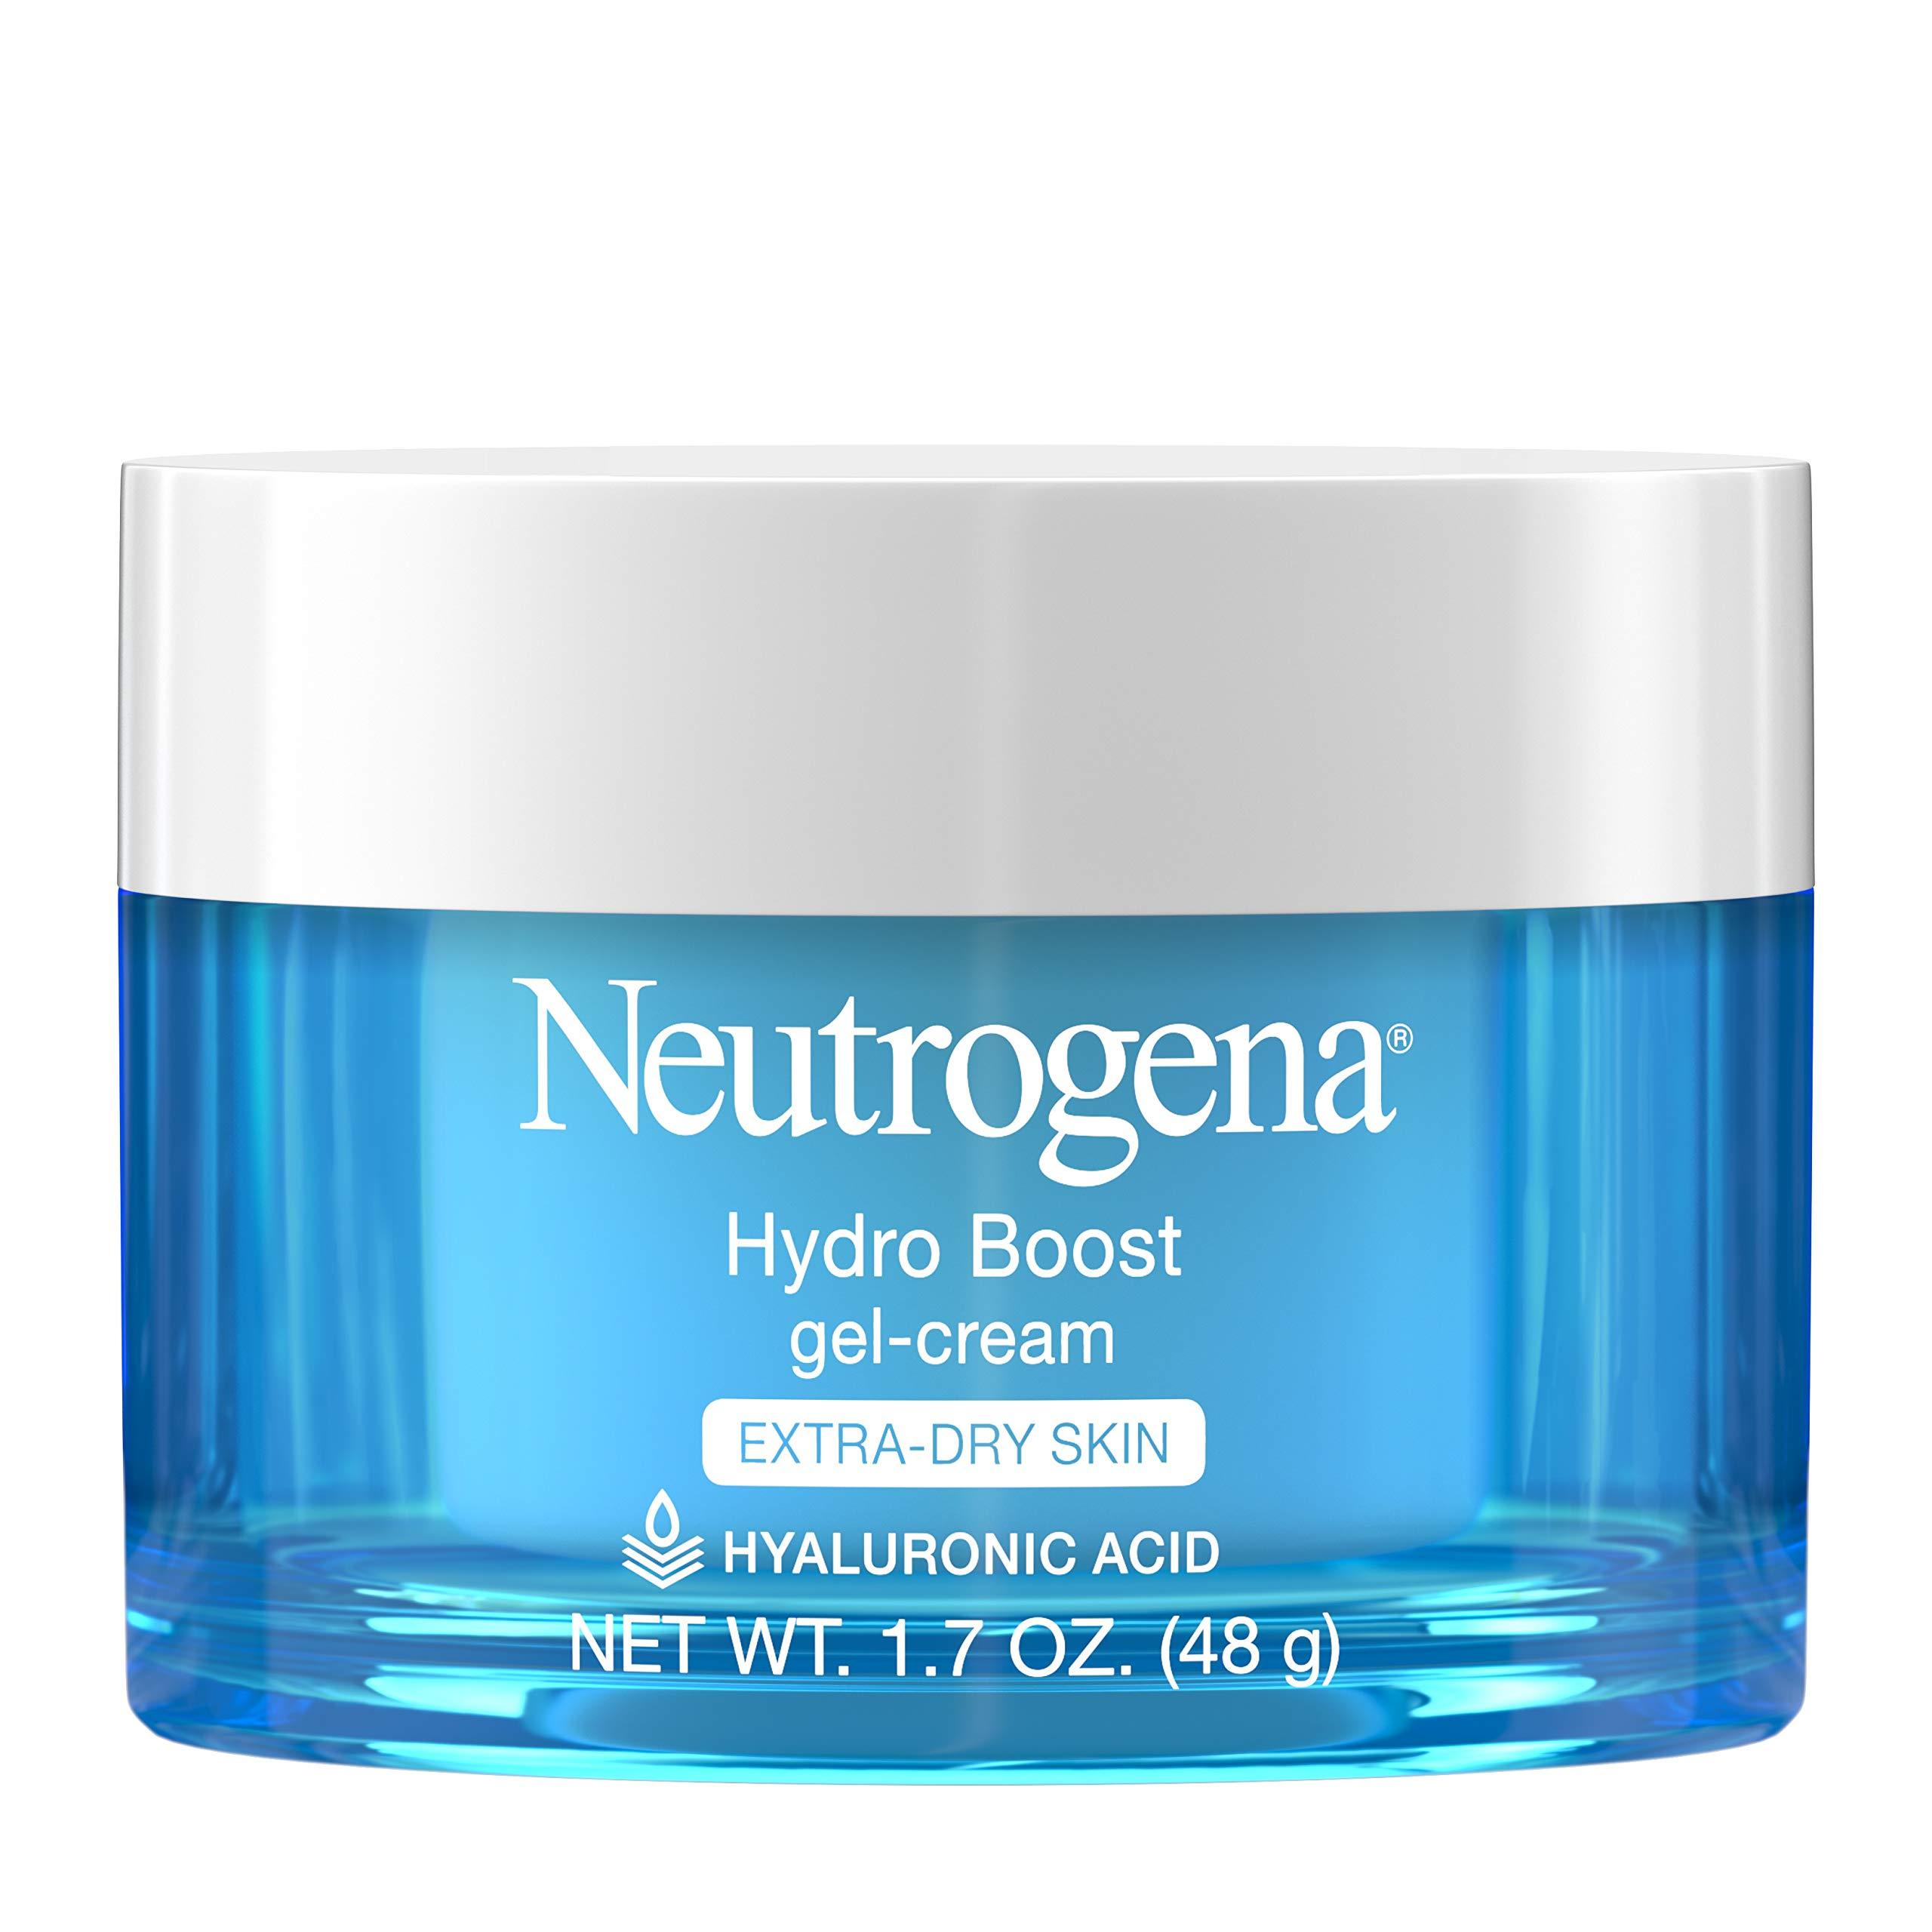 Neutrogena Hydro Boost Hyaluronic Acid Hydrating Face Moisturizer Gel-Cream to Hydrate and Smooth Extra-Dry Skin, 1.7 oz by Neutrogena